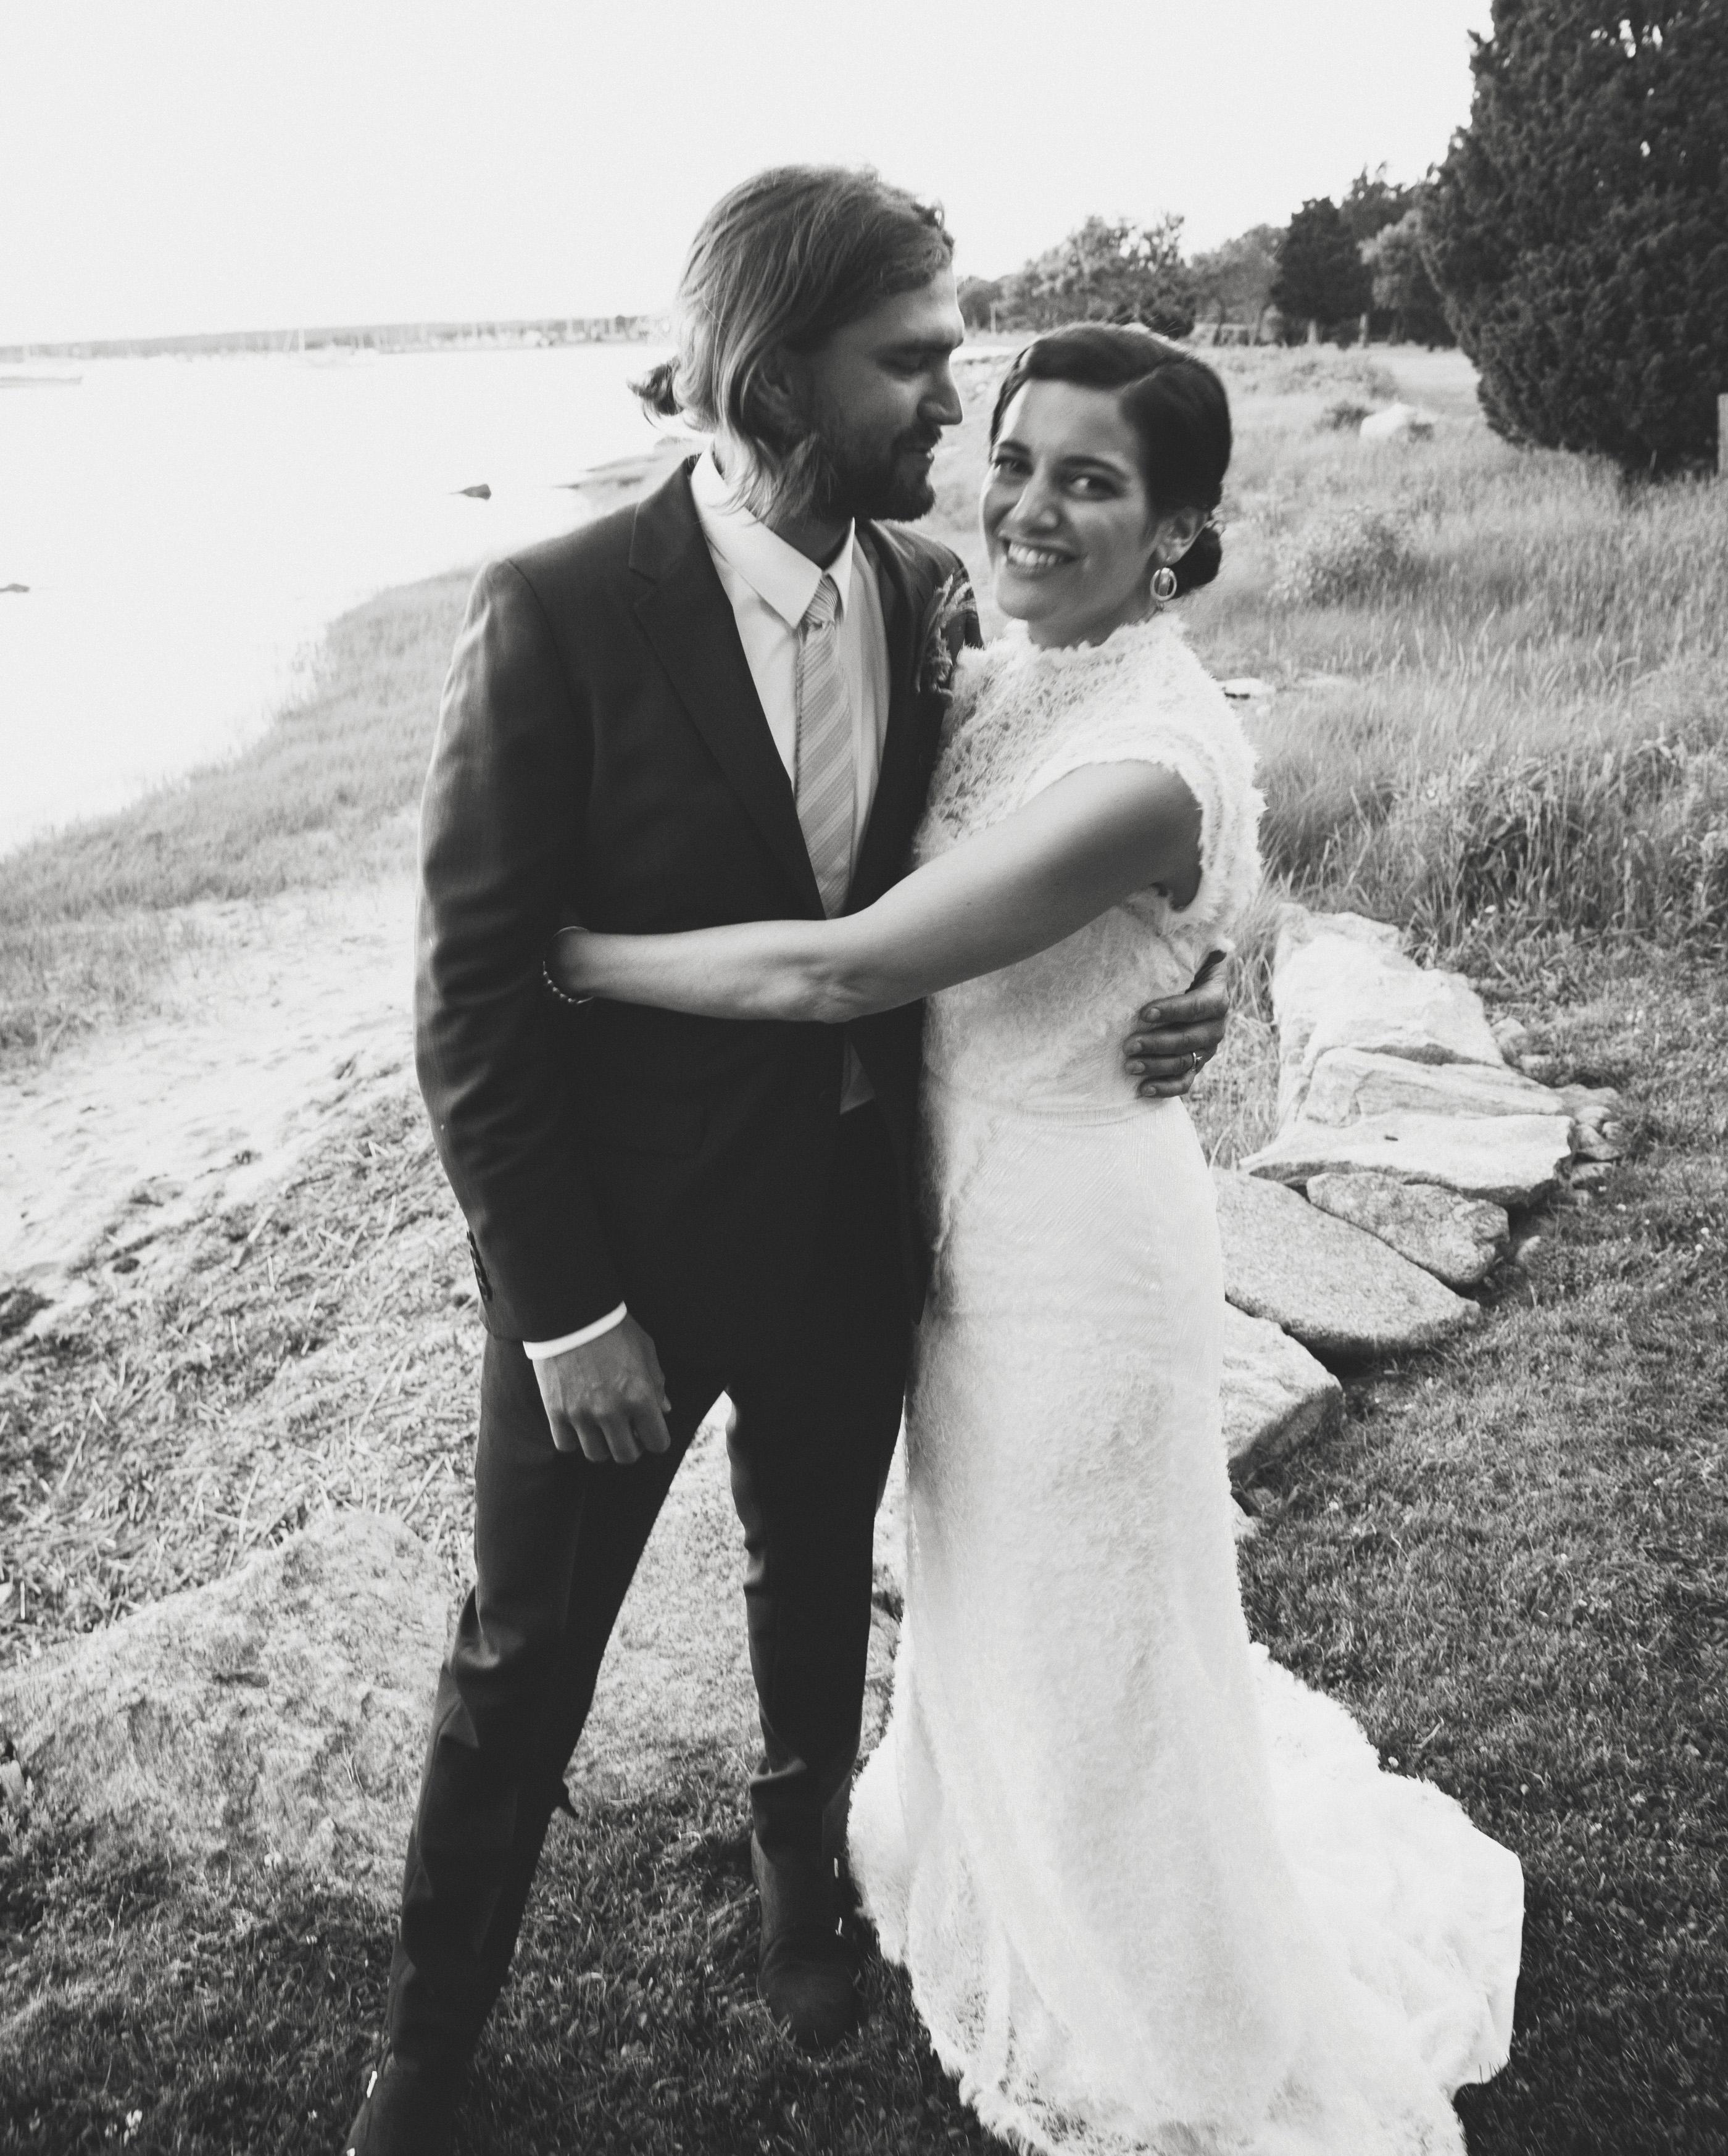 lilly-carter-wedding-couple-00608-s112037-0715.jpg